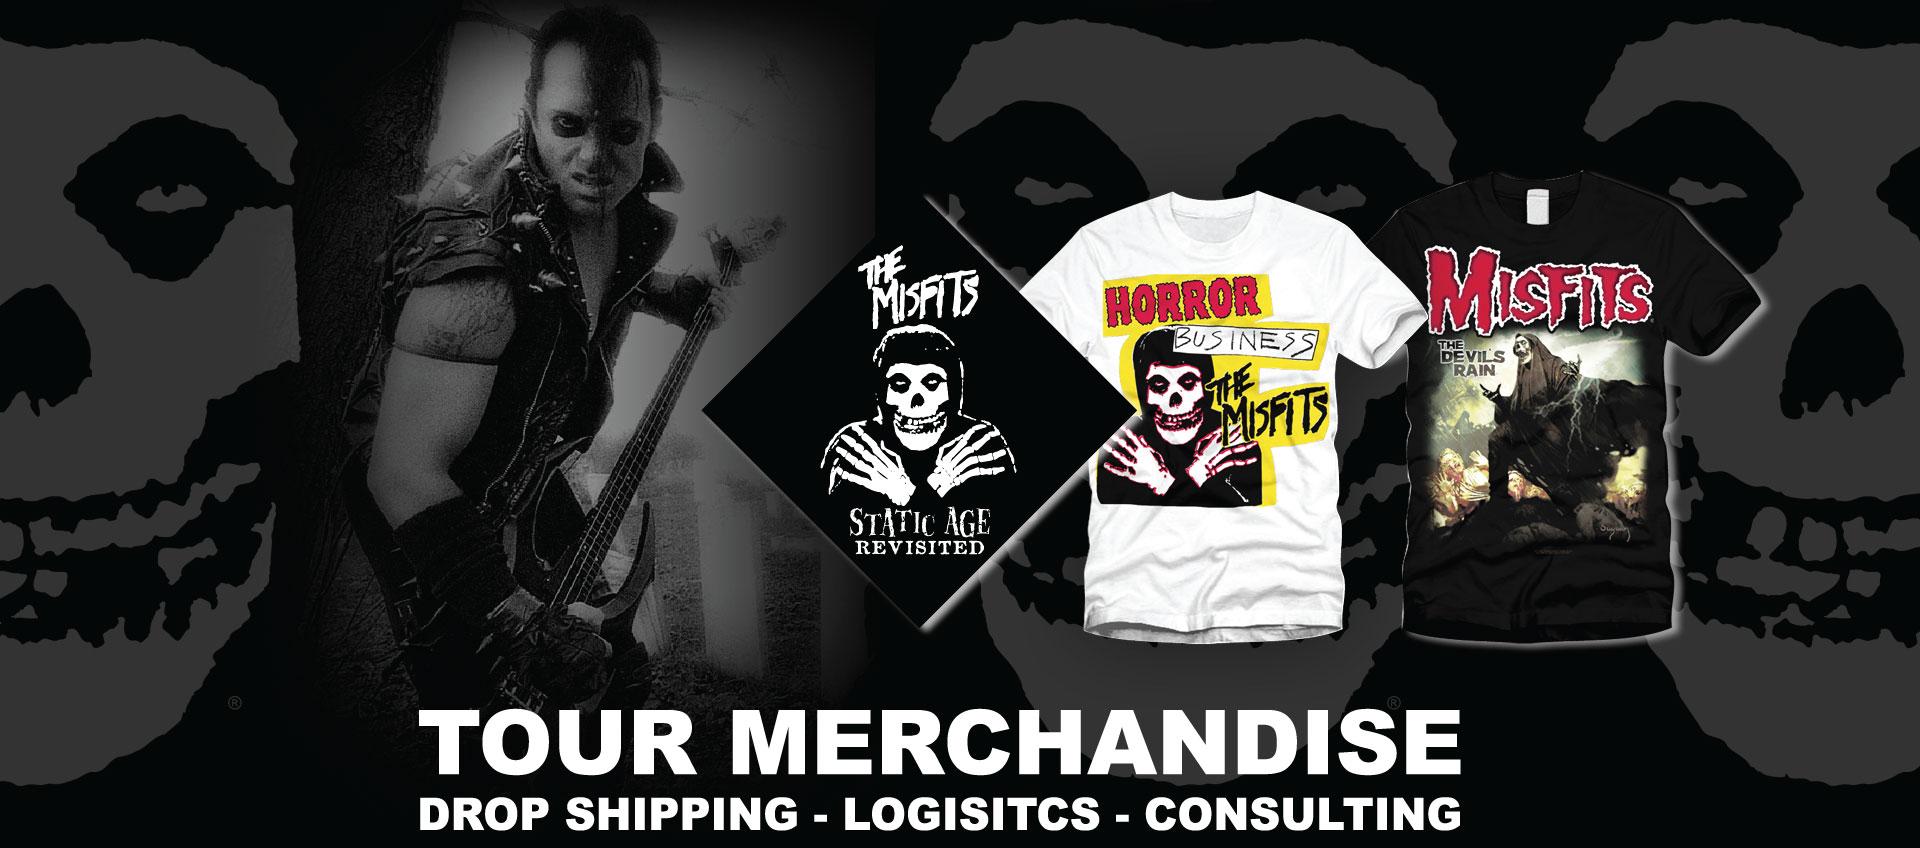 Tour Merchandise